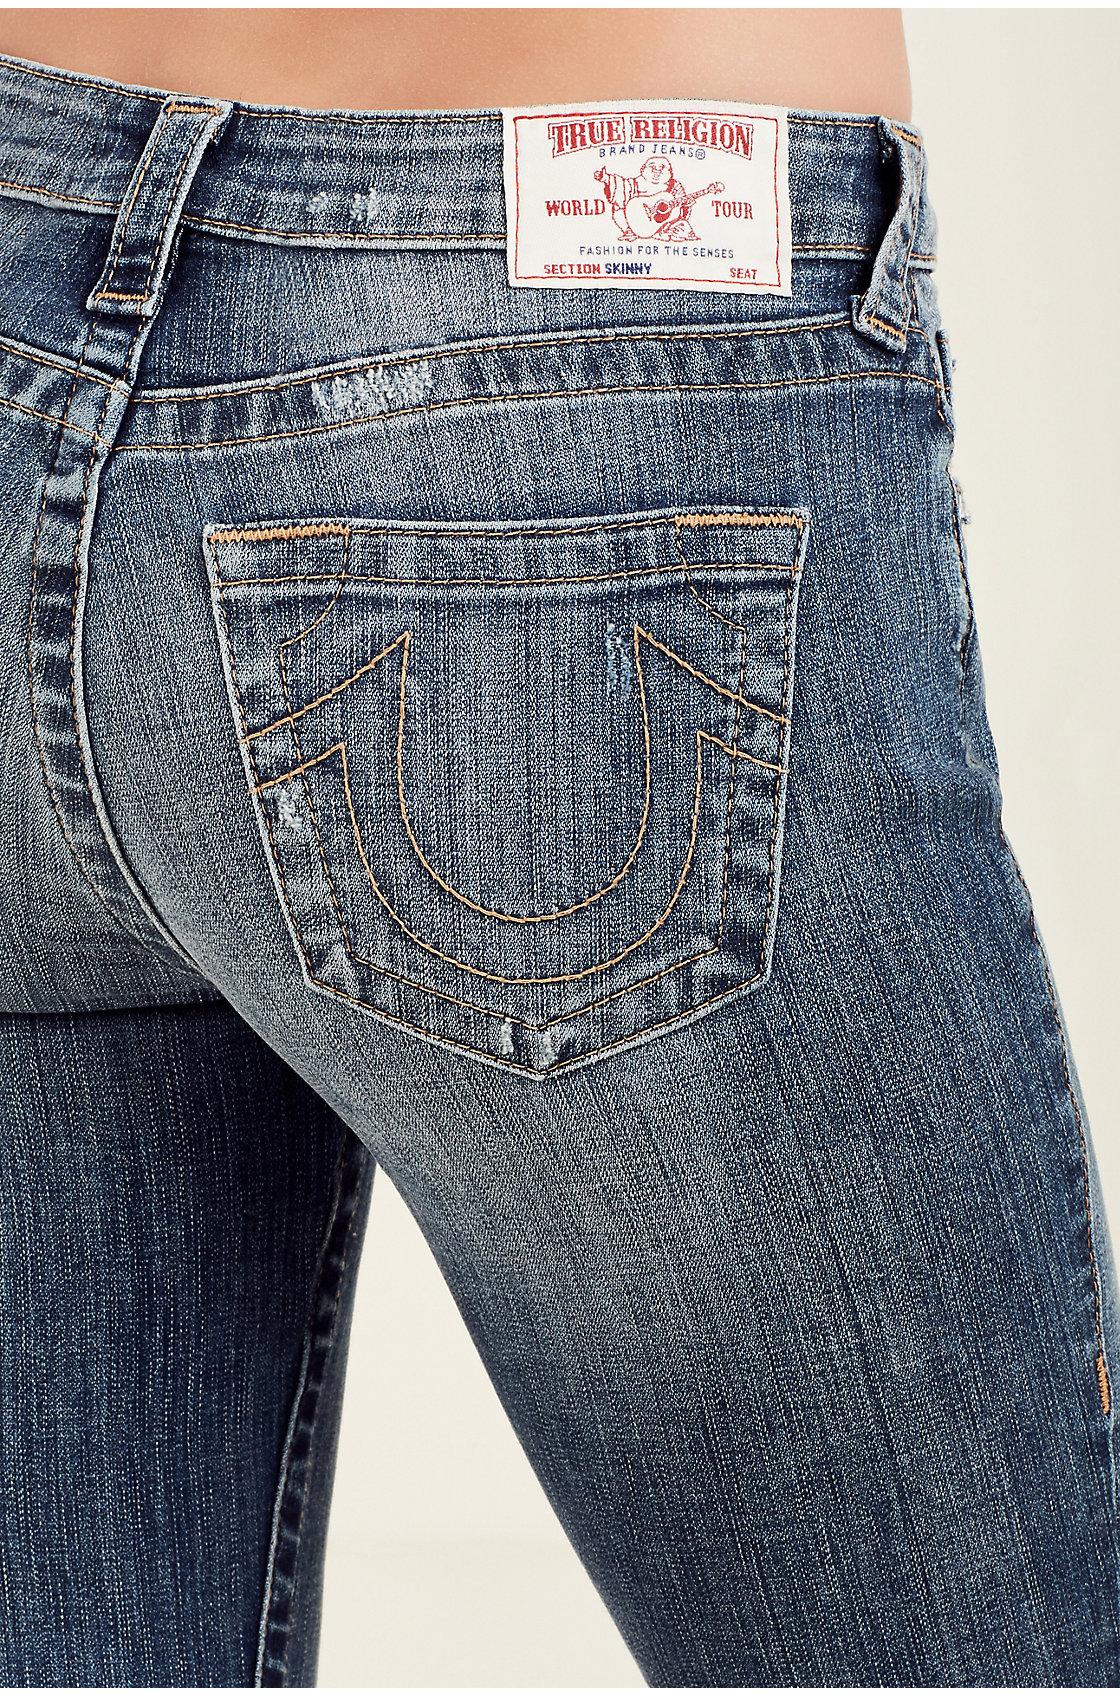 eb30ca934a4 True Religion Women s Curvy Skinny Fossil Silk Jeans w  Rips in ...